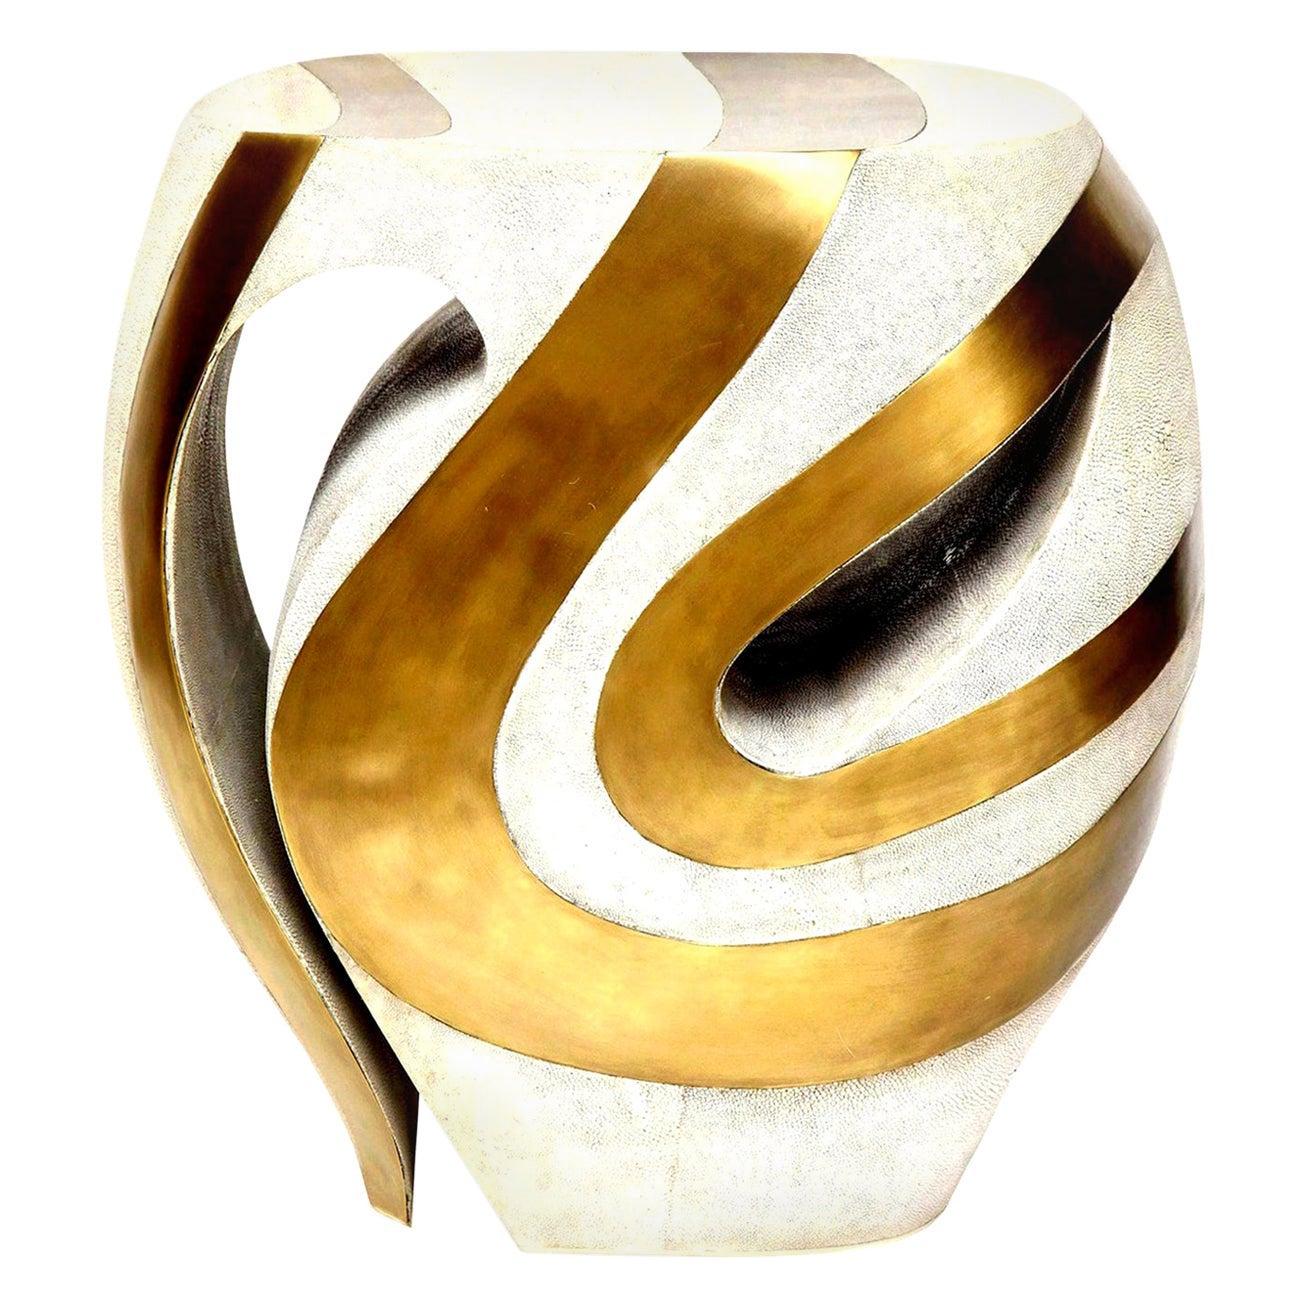 Shagreen Stool with Brass Details, Cream Shagreen, Organic Shape, Contemporary